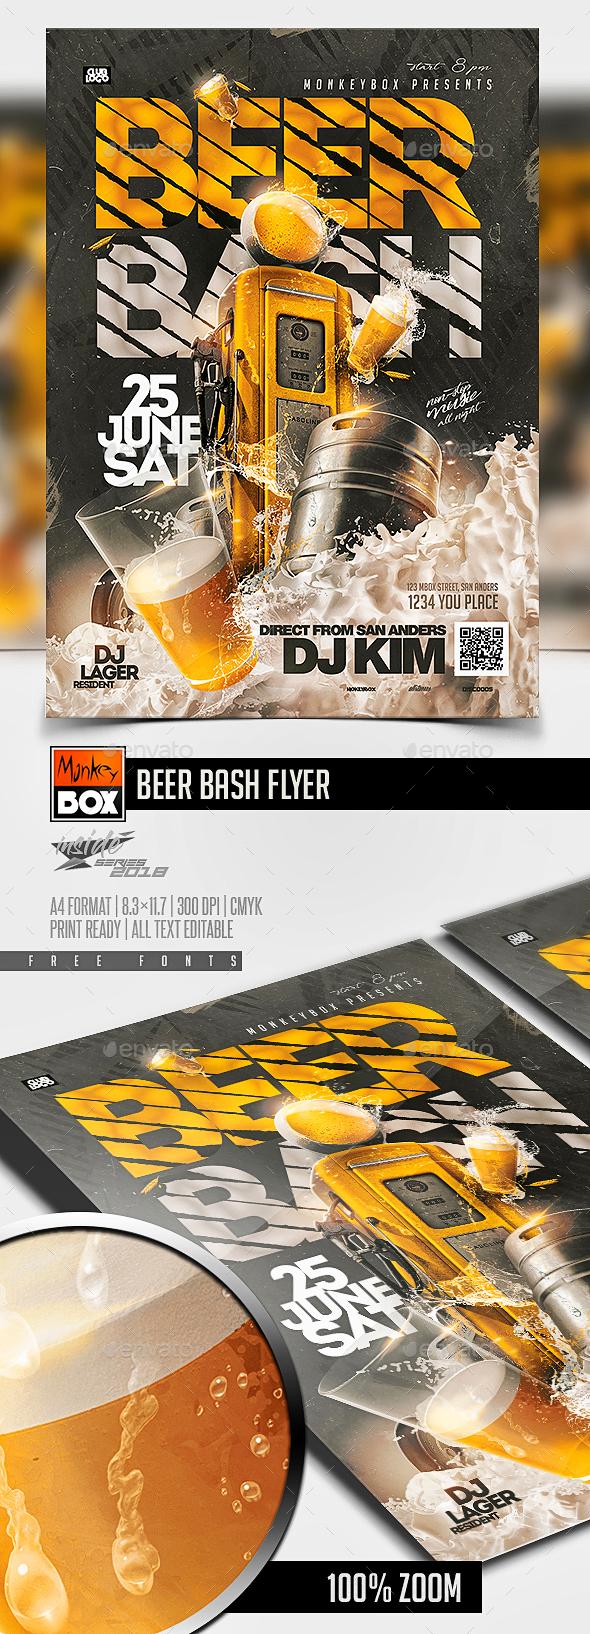 Beer Bash Flyer - Events Flyers